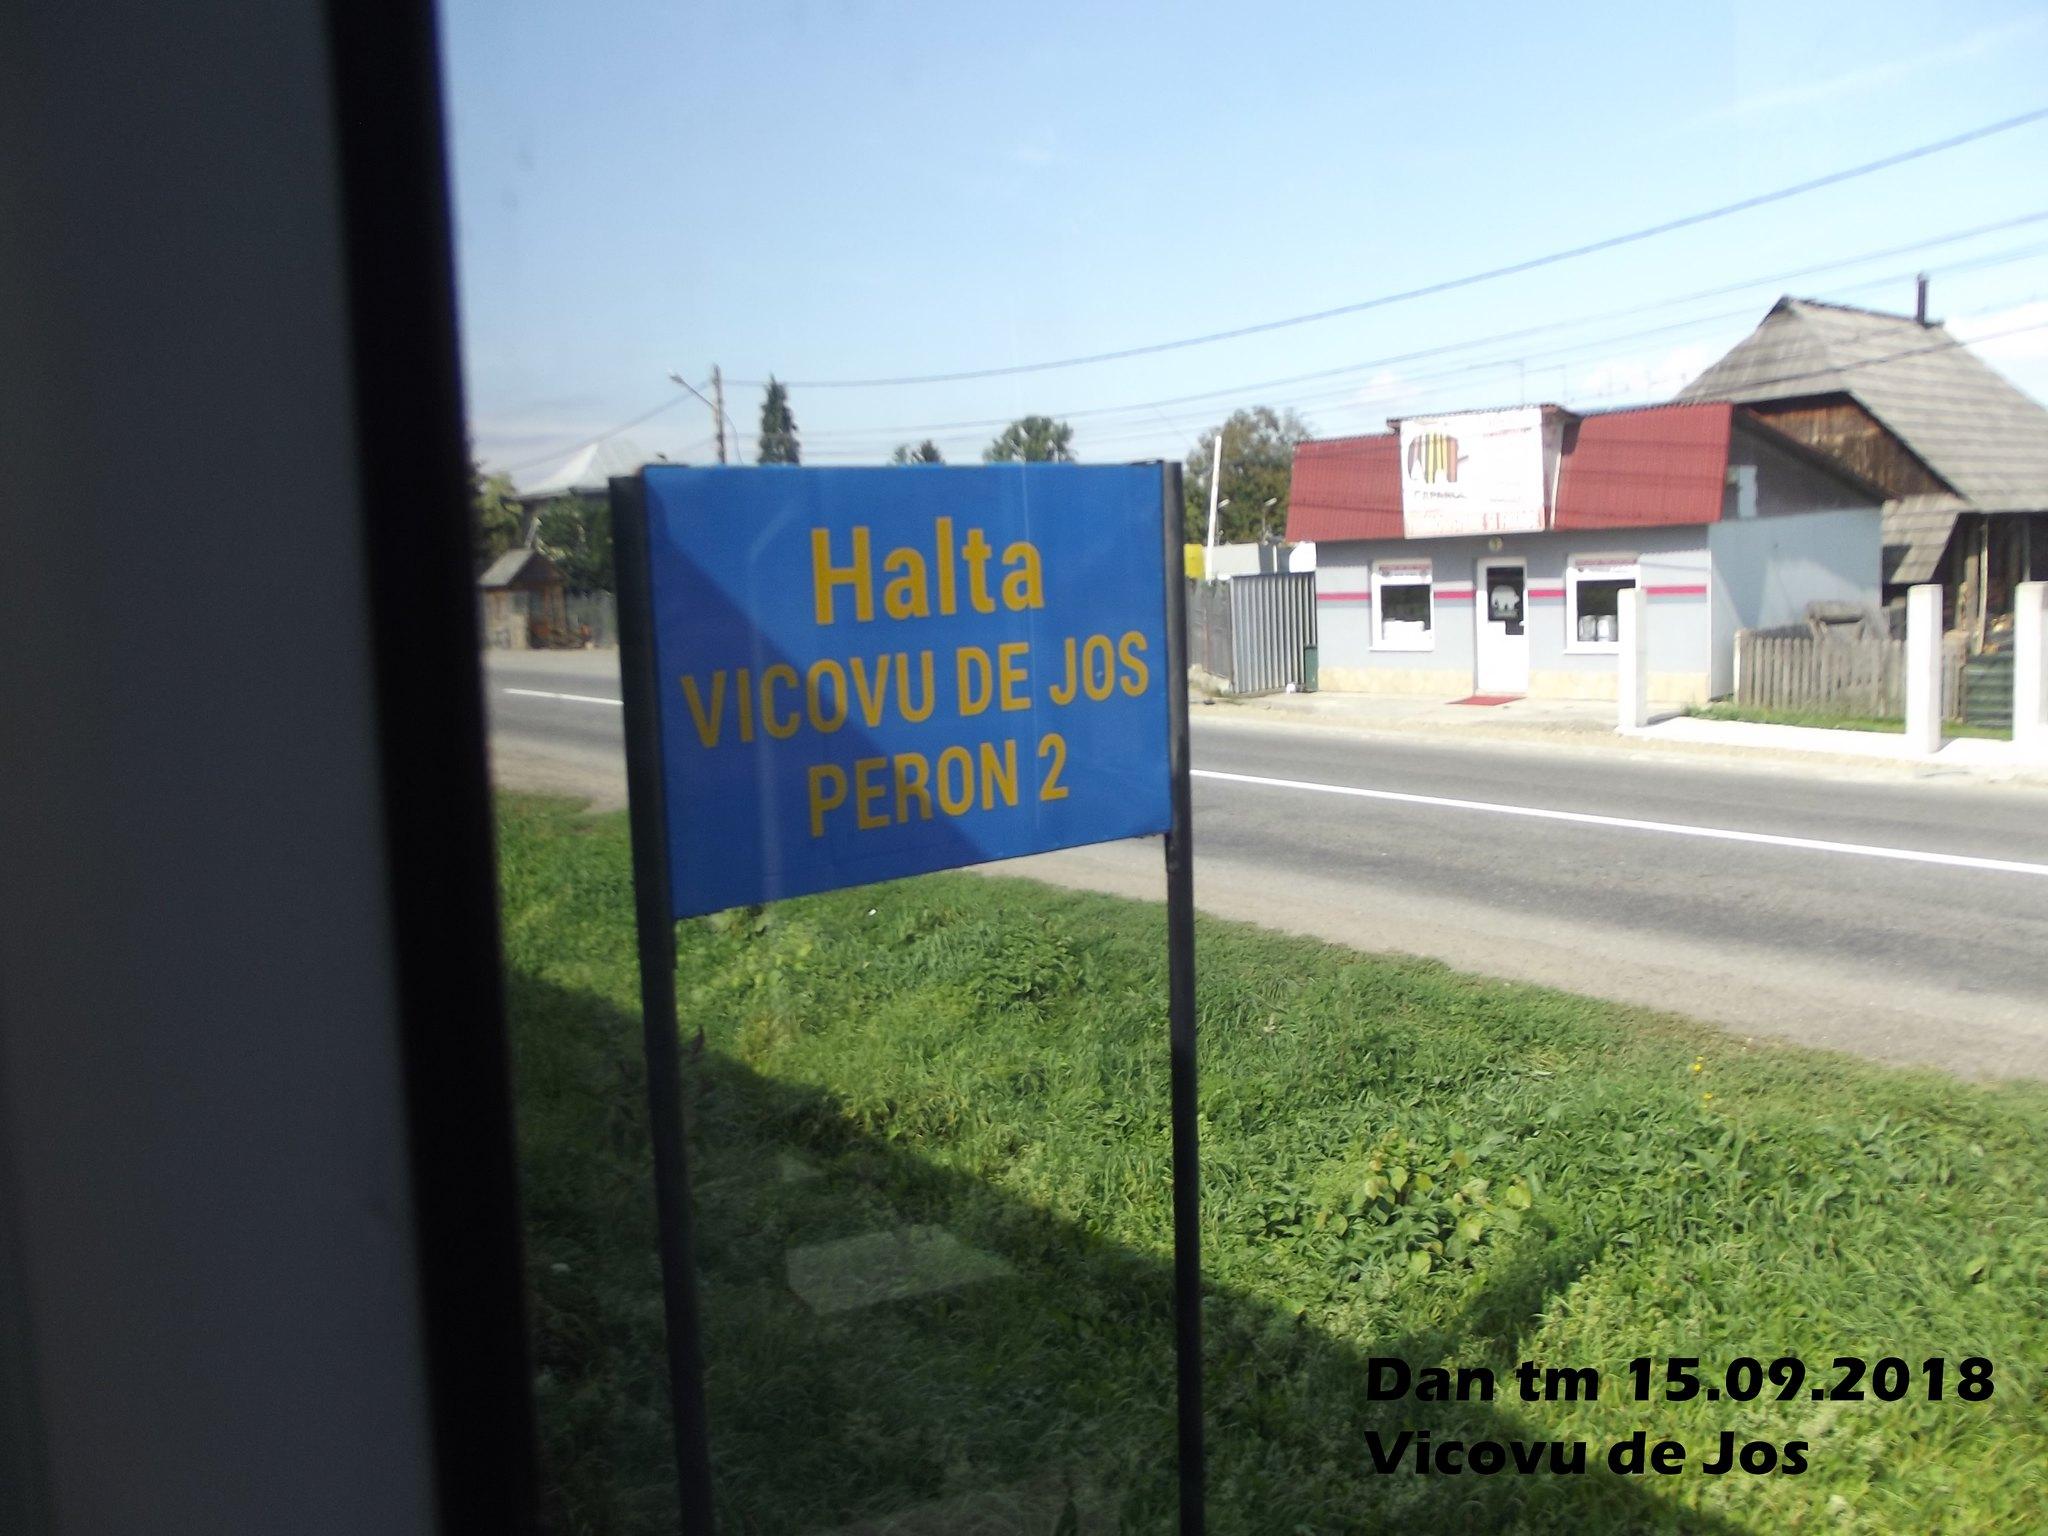 515 : Dorneşti - Gura Putnei - (Putna) - Nisipitu - Seletin UKR - Pagina 47 44016736764_ba3abcc373_k